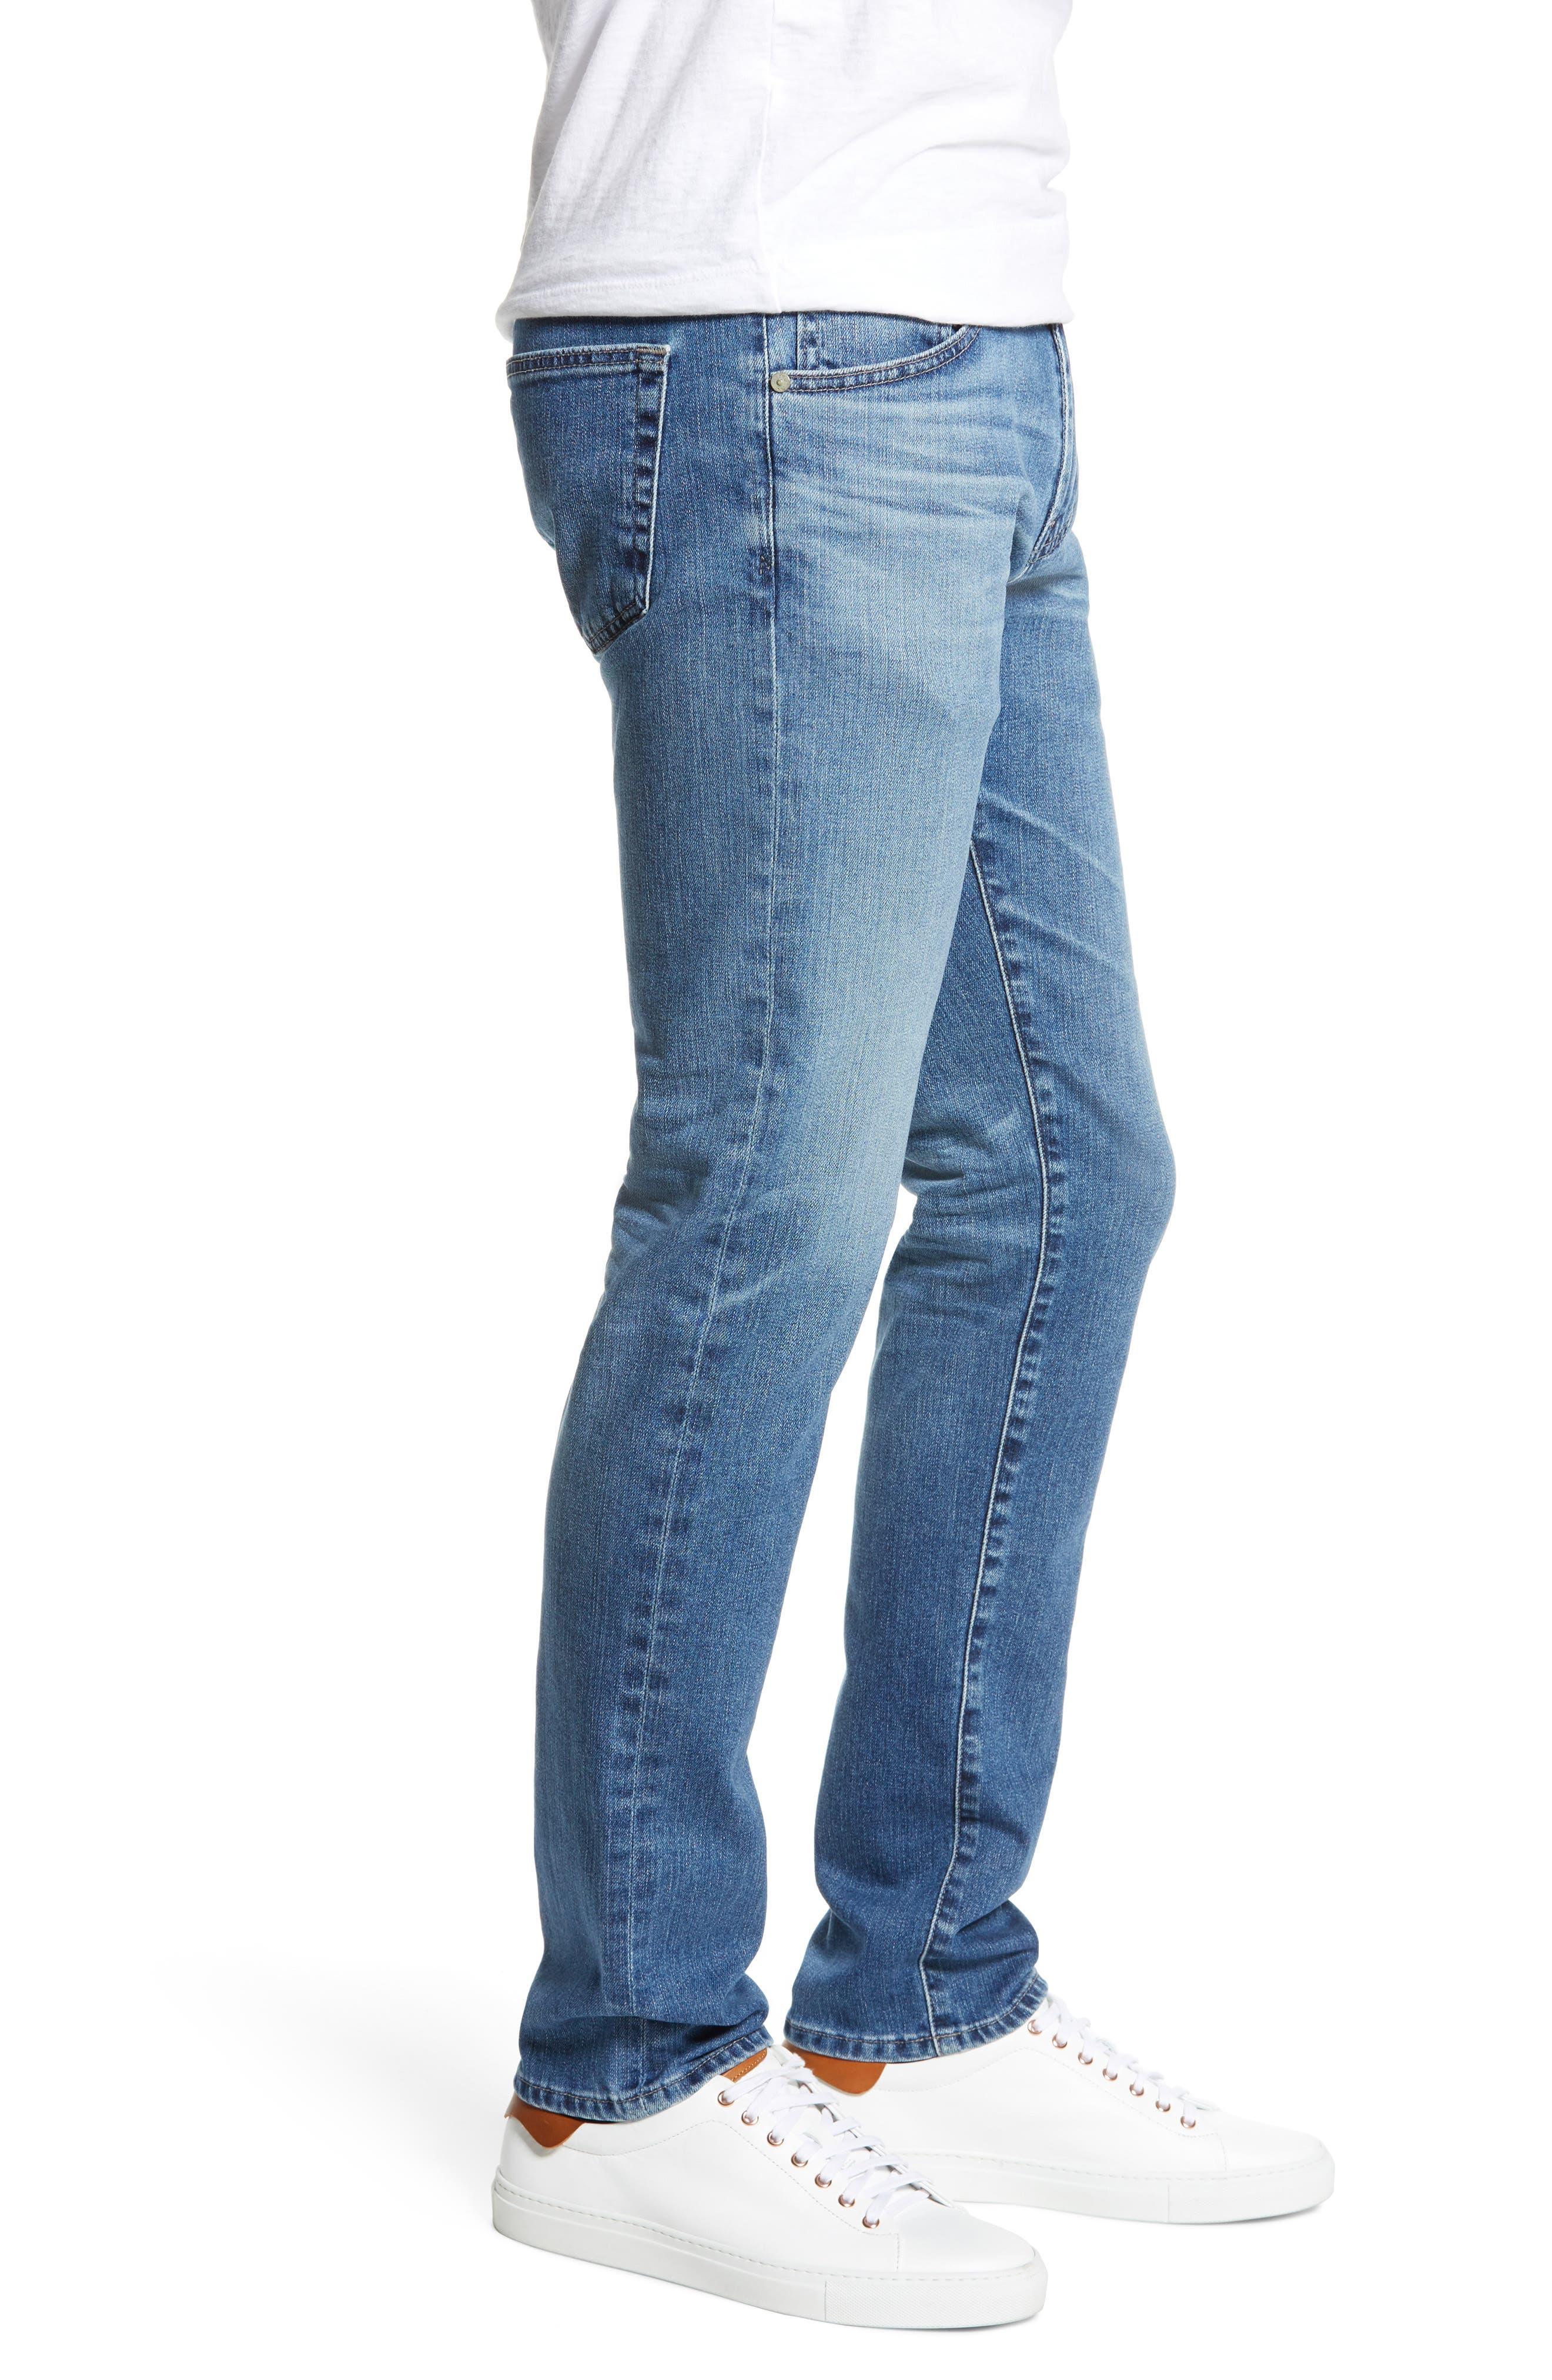 Tellis Slim Fit Jeans,                             Alternate thumbnail 3, color,                             16 YEARS EAVES